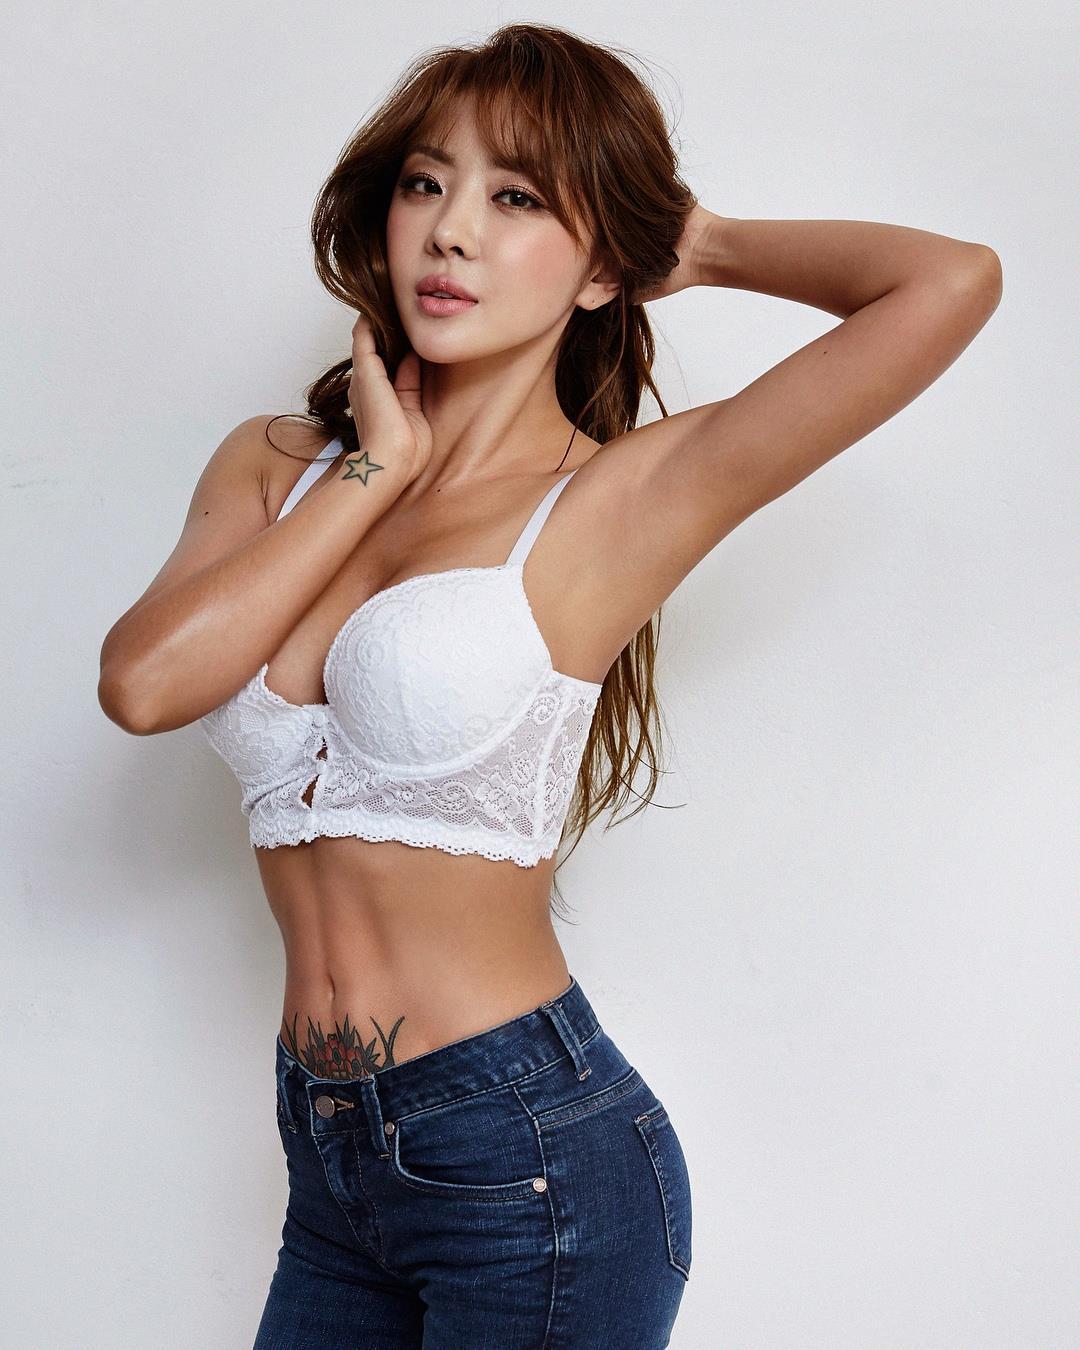 brown eyed girls的成員narsha在JTBC《與肥胖的戰爭-愉快的減肥生活》中通過挑戰49天的減肥,獲得了緊緻完美的身材,原本以豐腴身材出名的她,通過減肥成為健康美和性感美的標誌。 本文翻譯自ALLETS